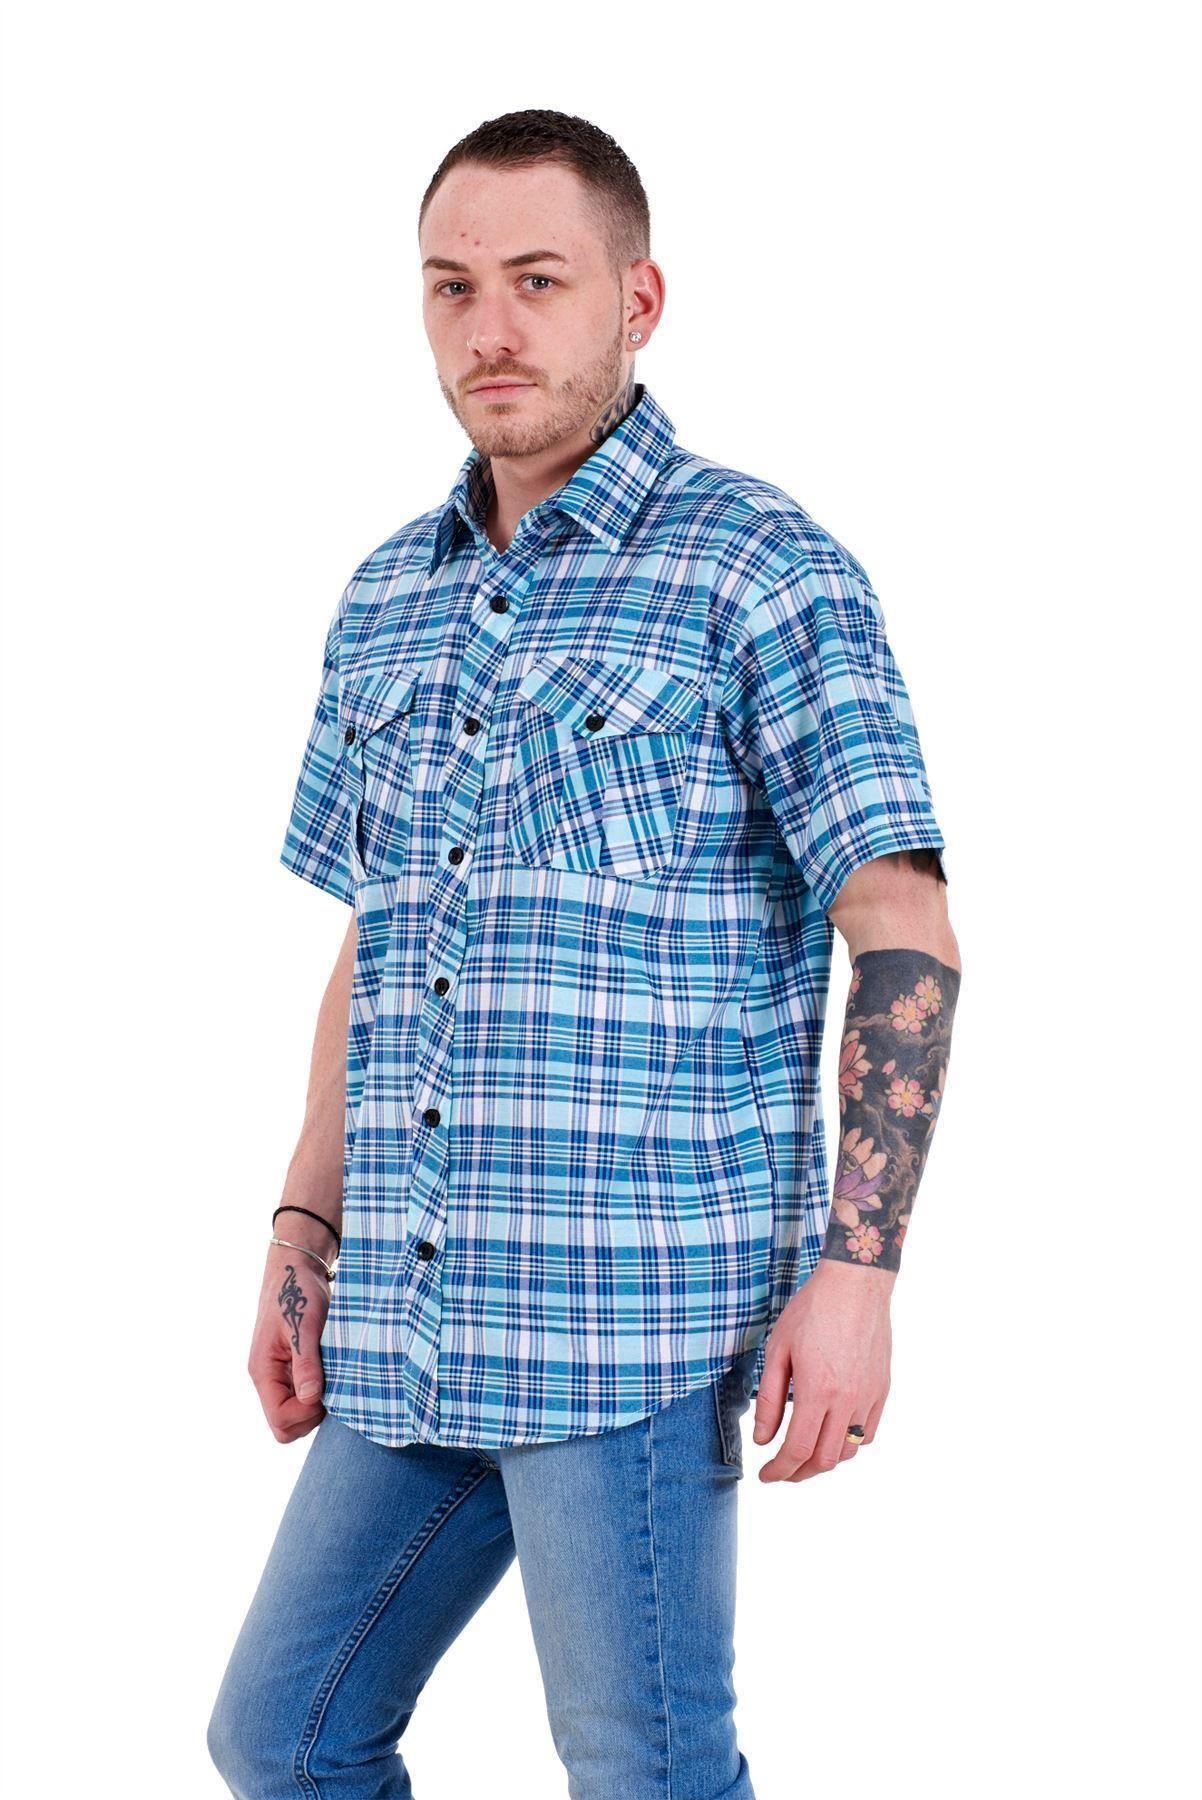 Mens-Regular-Big-Size-Shirts-Checked-Cotton-Blend-Casual-Short-Sleeve-M-to-5XL thumbnail 32